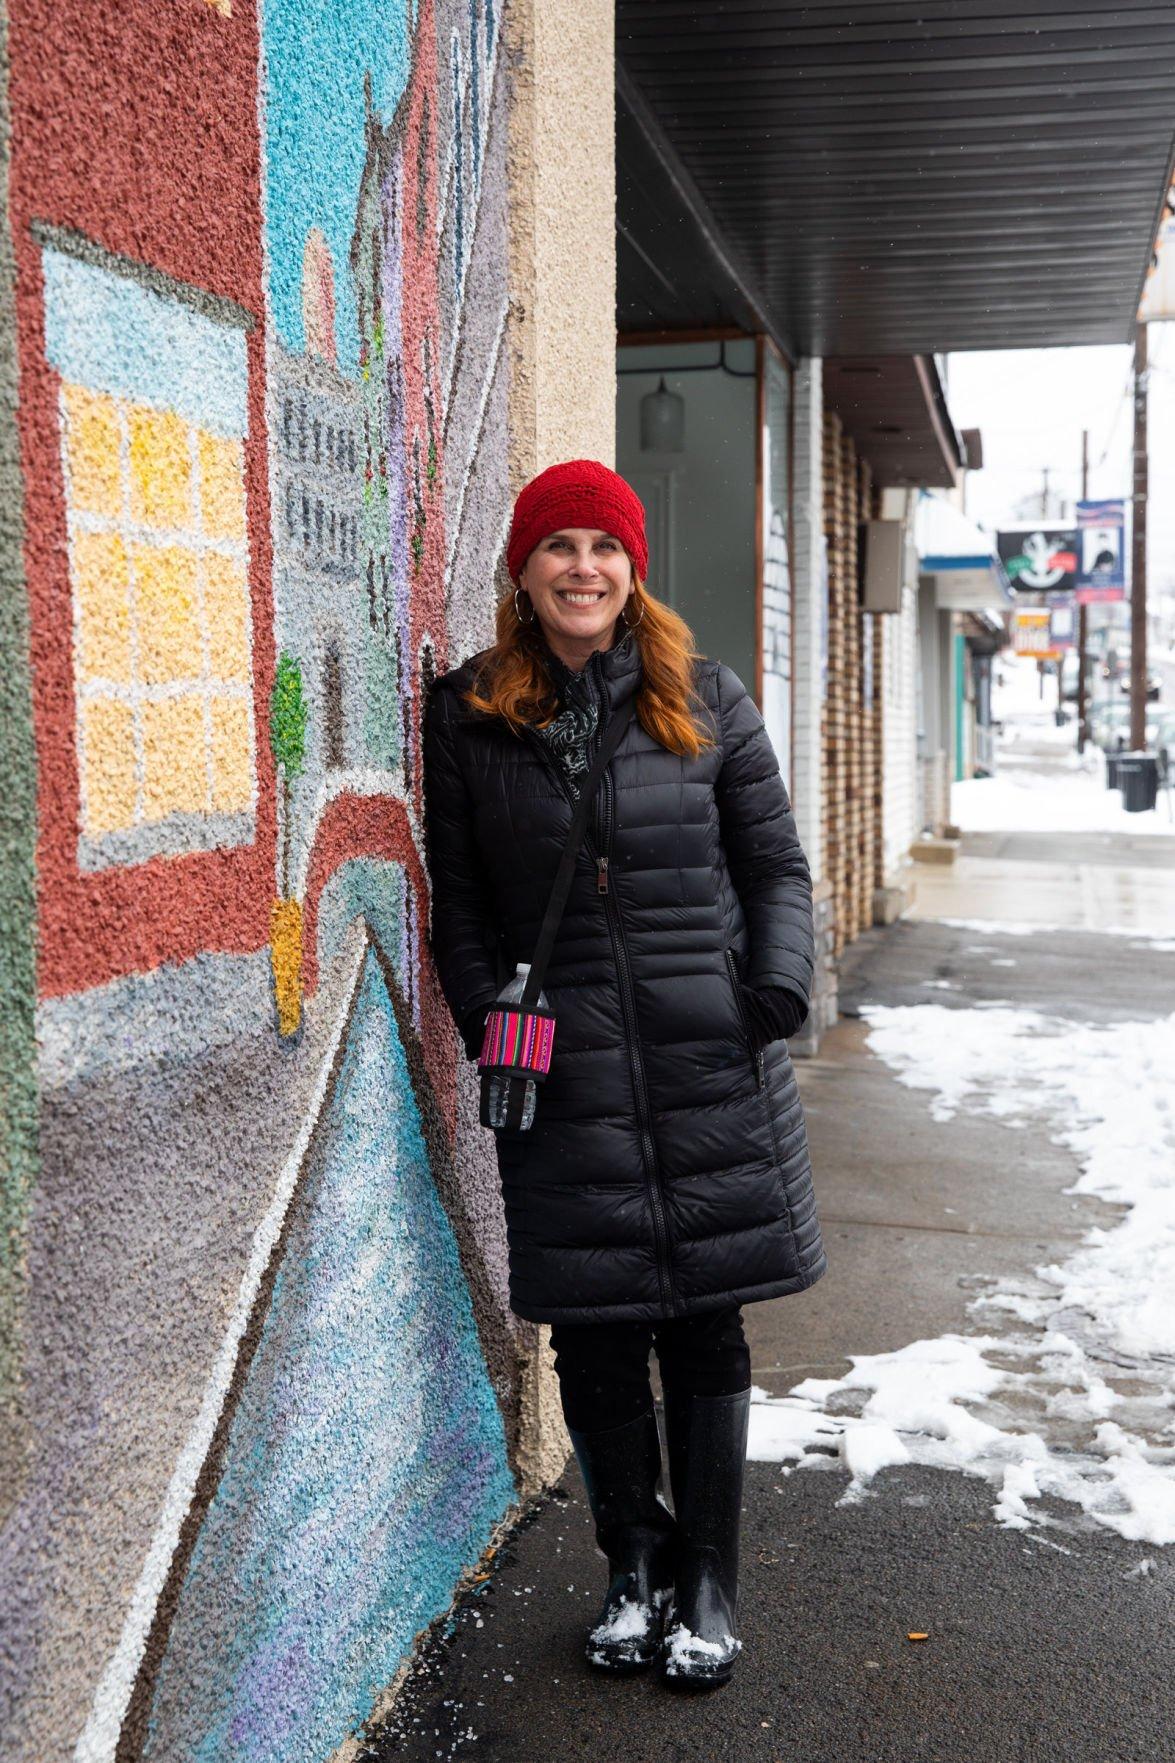 County arts and culture COVID-19 grants benefit a dozen artists, organizations